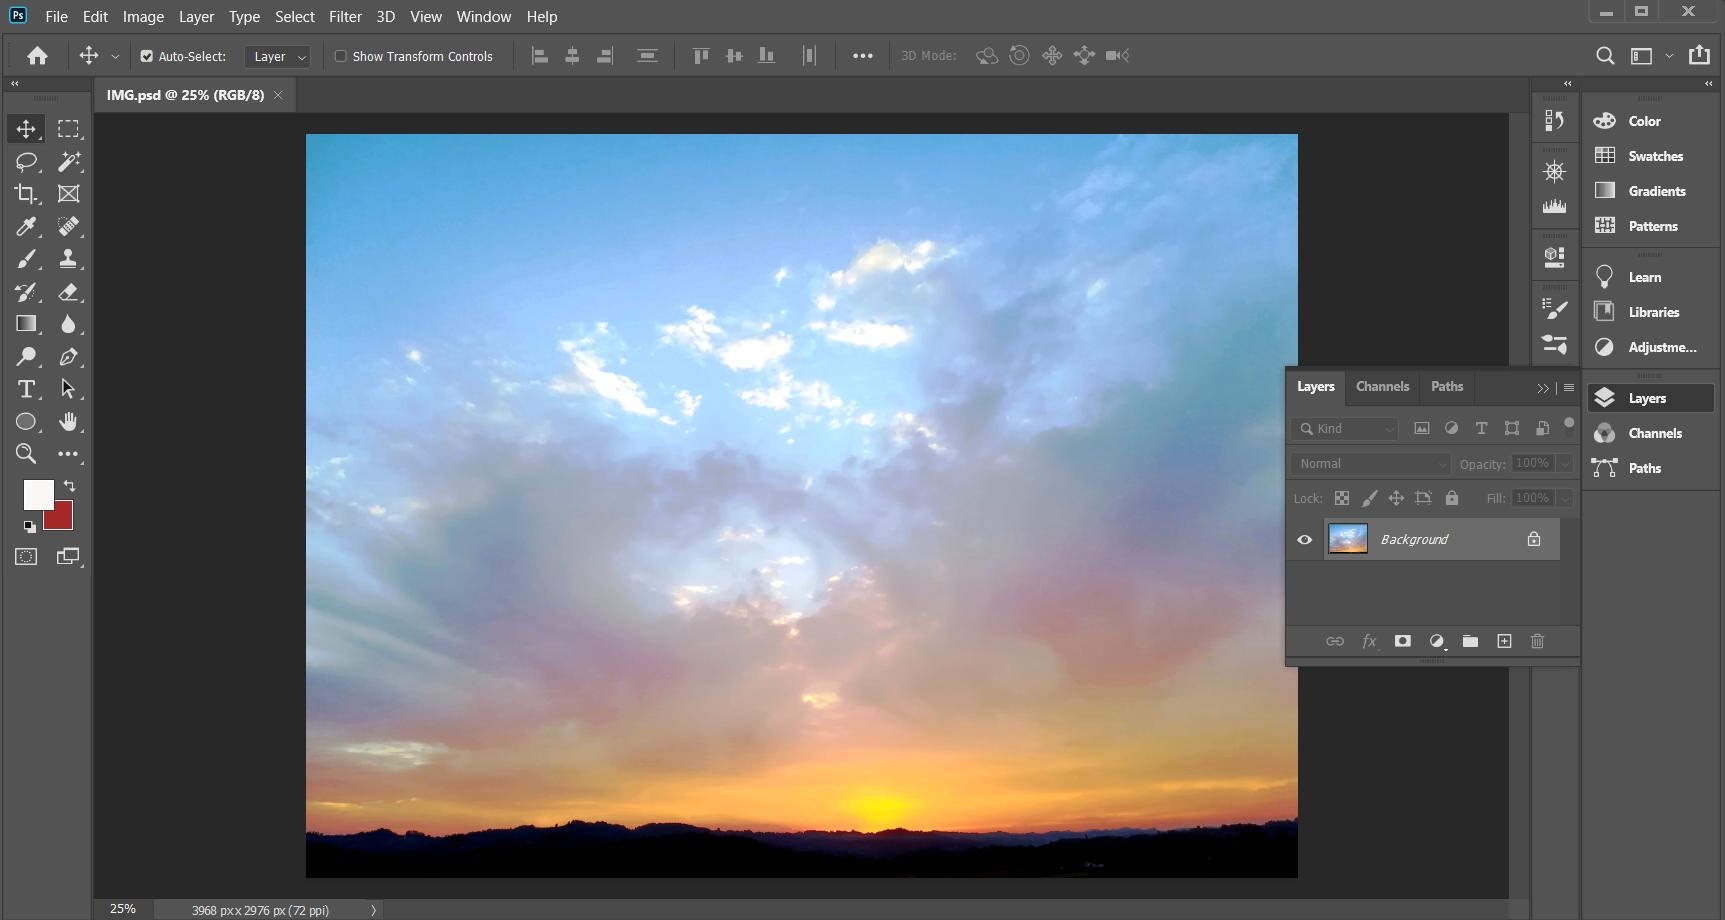 Best vector image file formats - PSD